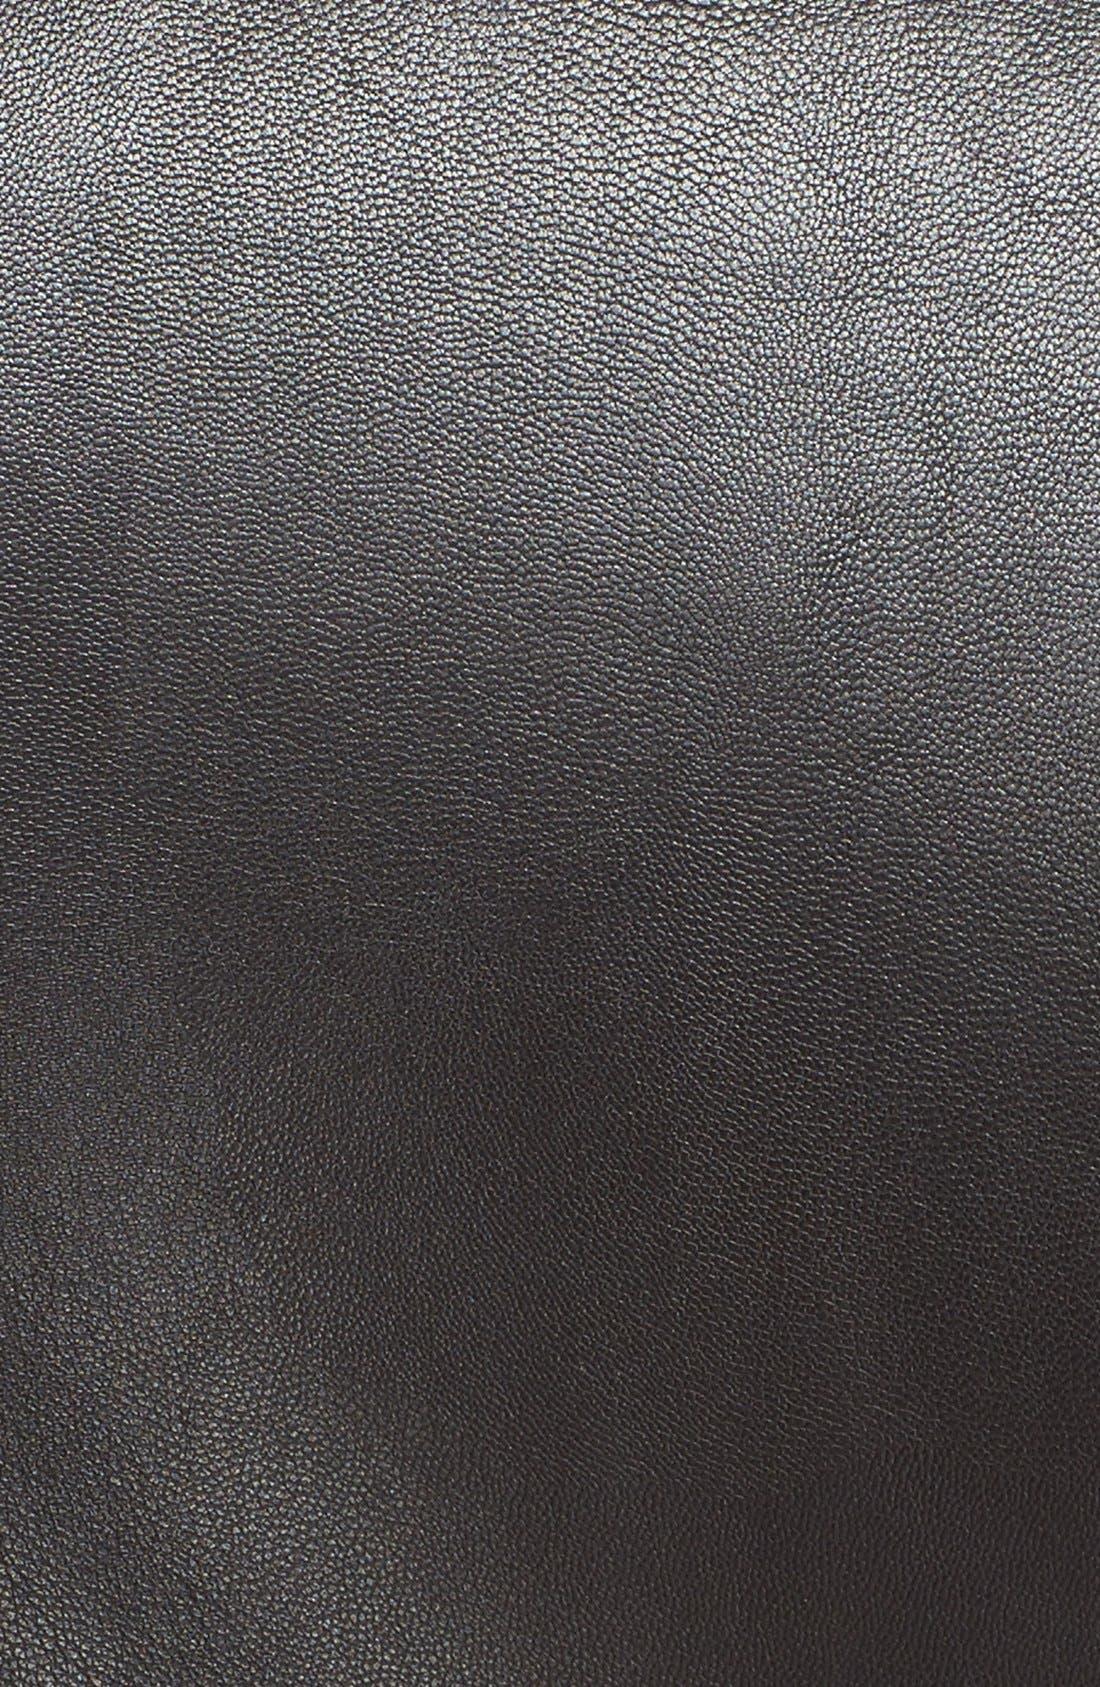 Alternate Image 3  - Moschino Chain & Imitation Pearl Embellished Faux Leather Jacket